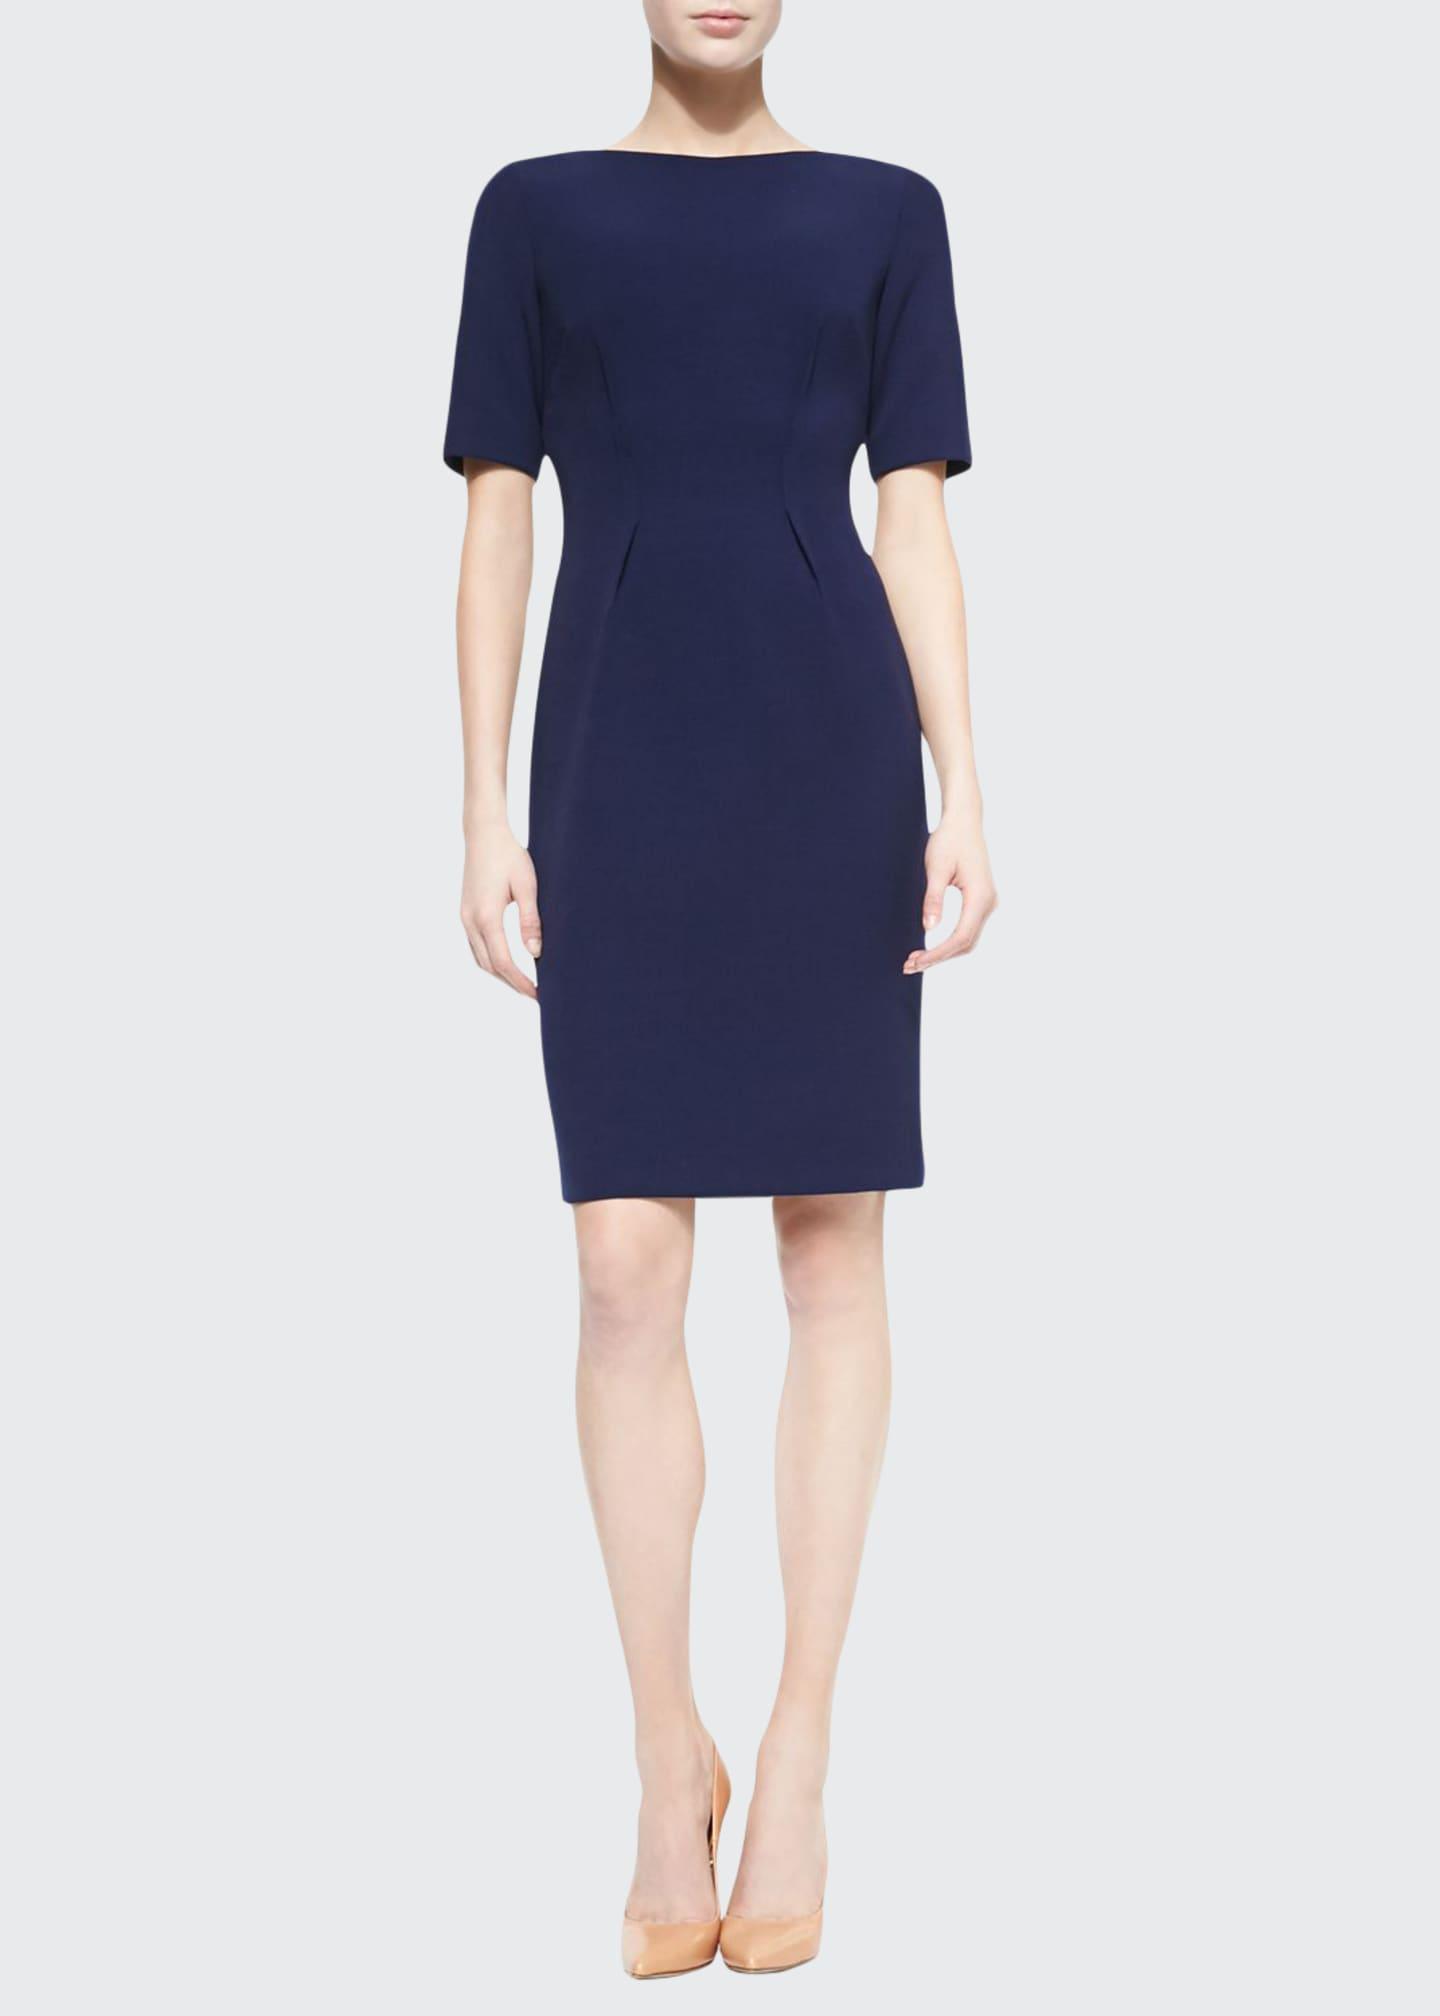 Lela Rose Claire Boat-Neck Dress